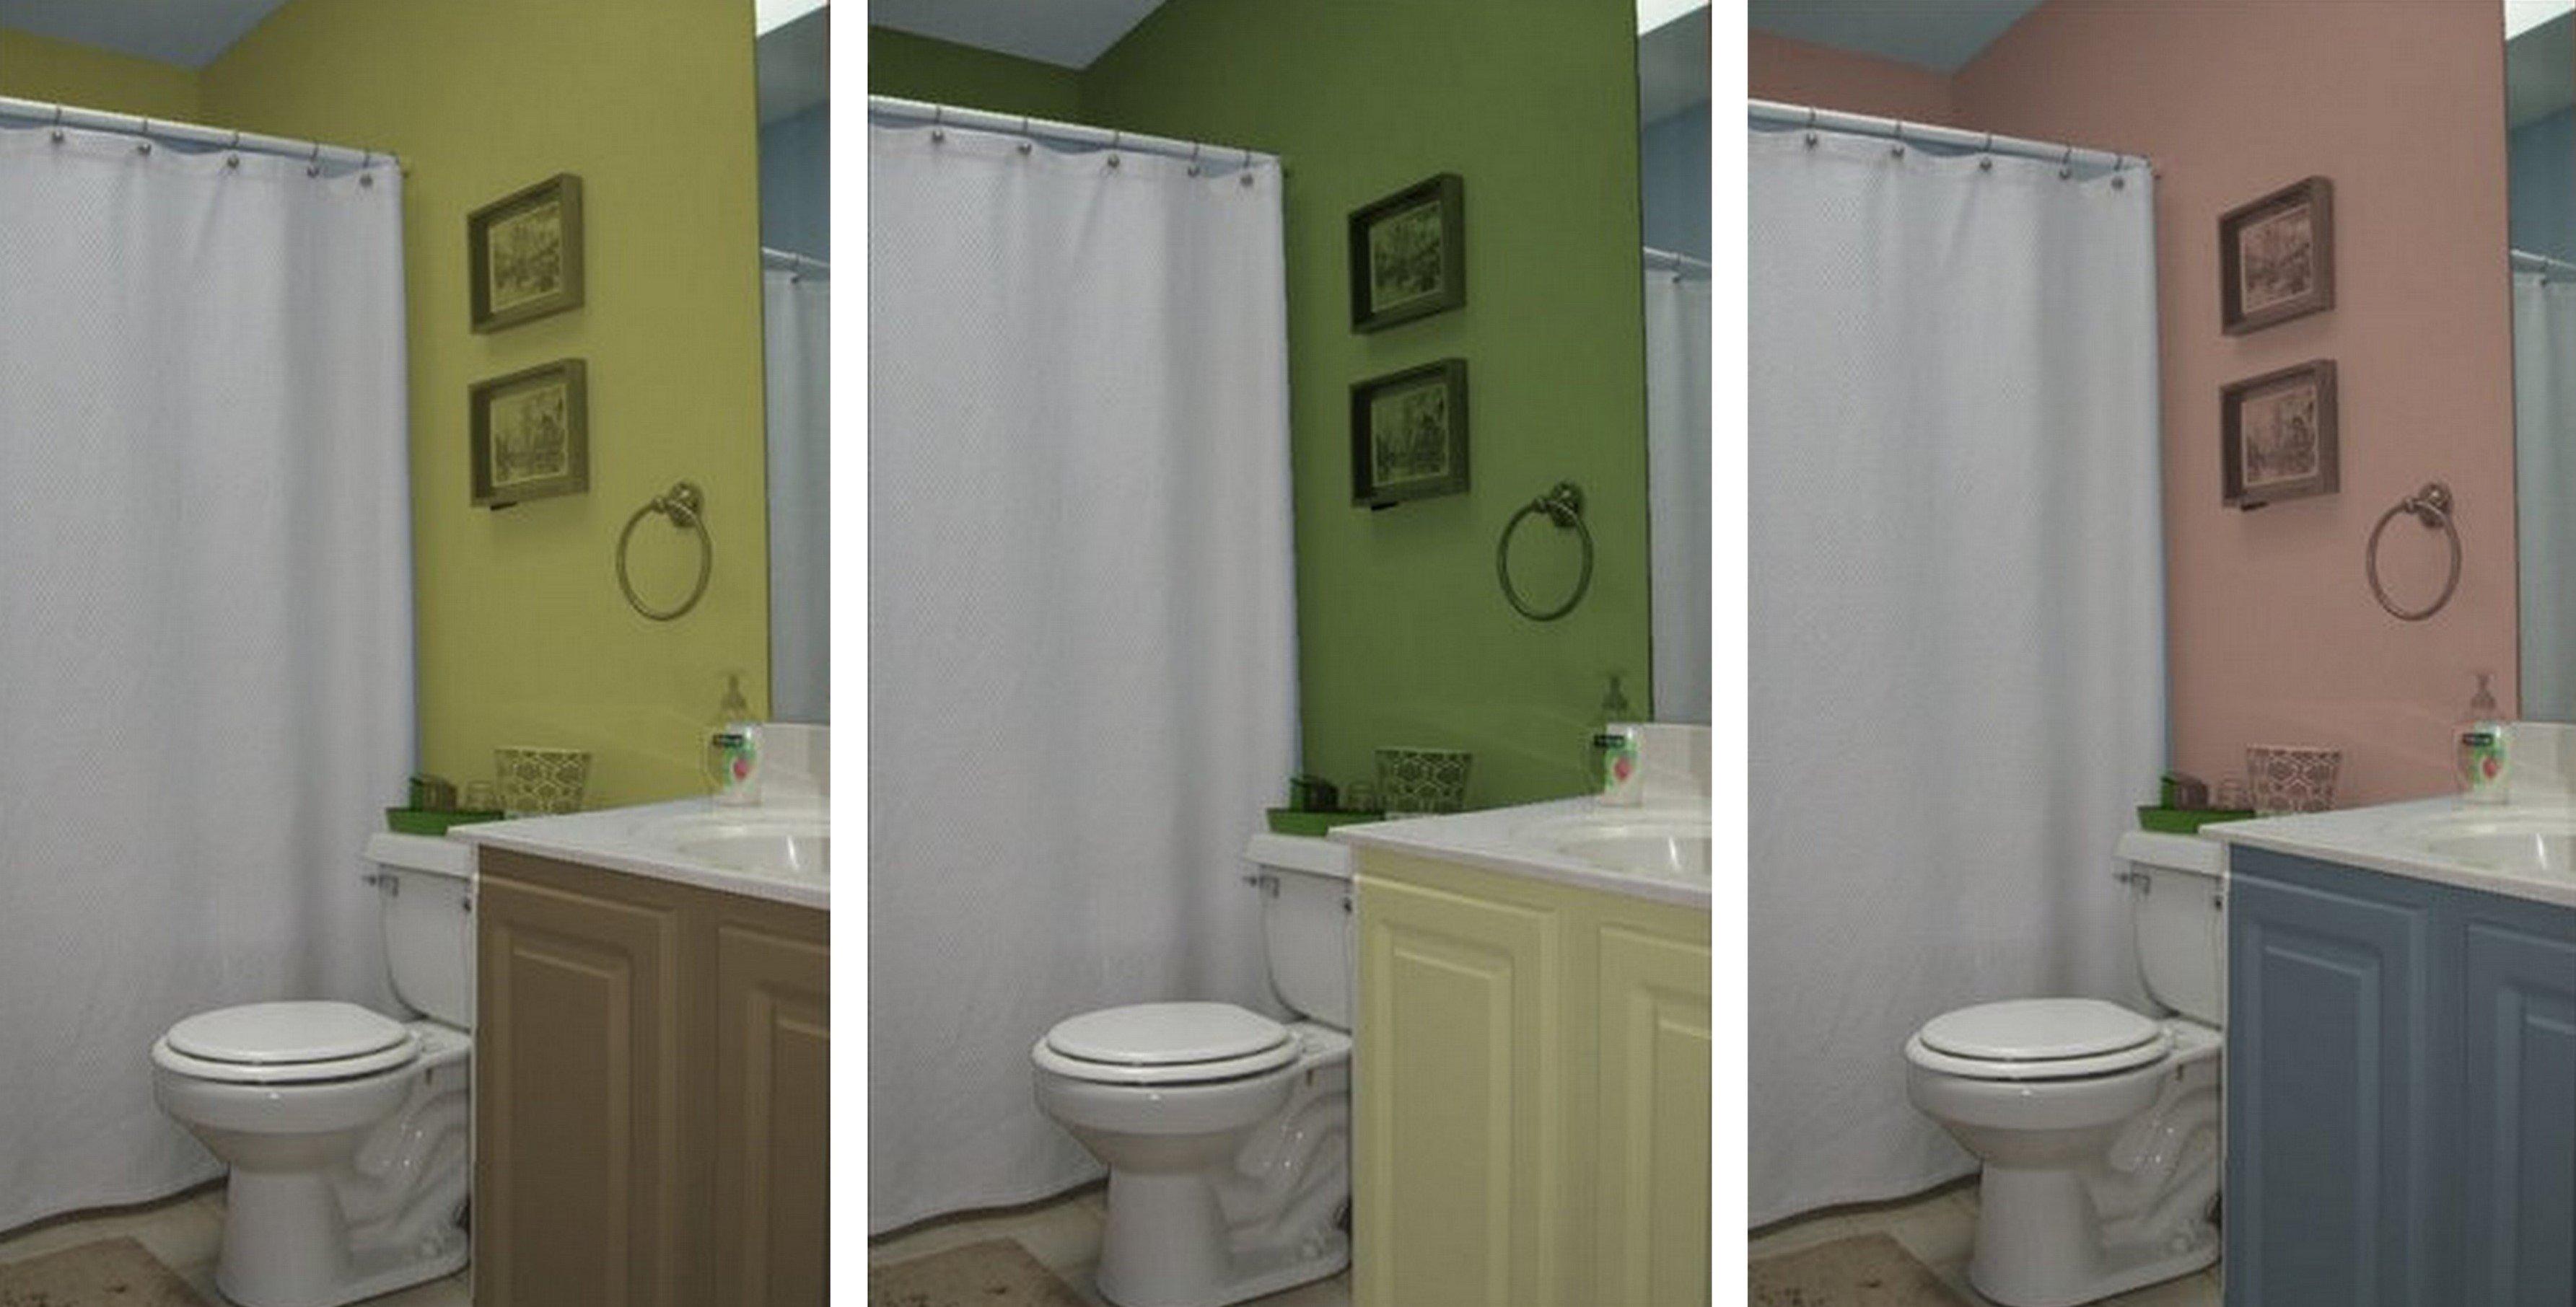 10 Unique Color Ideas For Small Bathrooms amazing of finest small bathroom color ideas have bathroo 2925 1